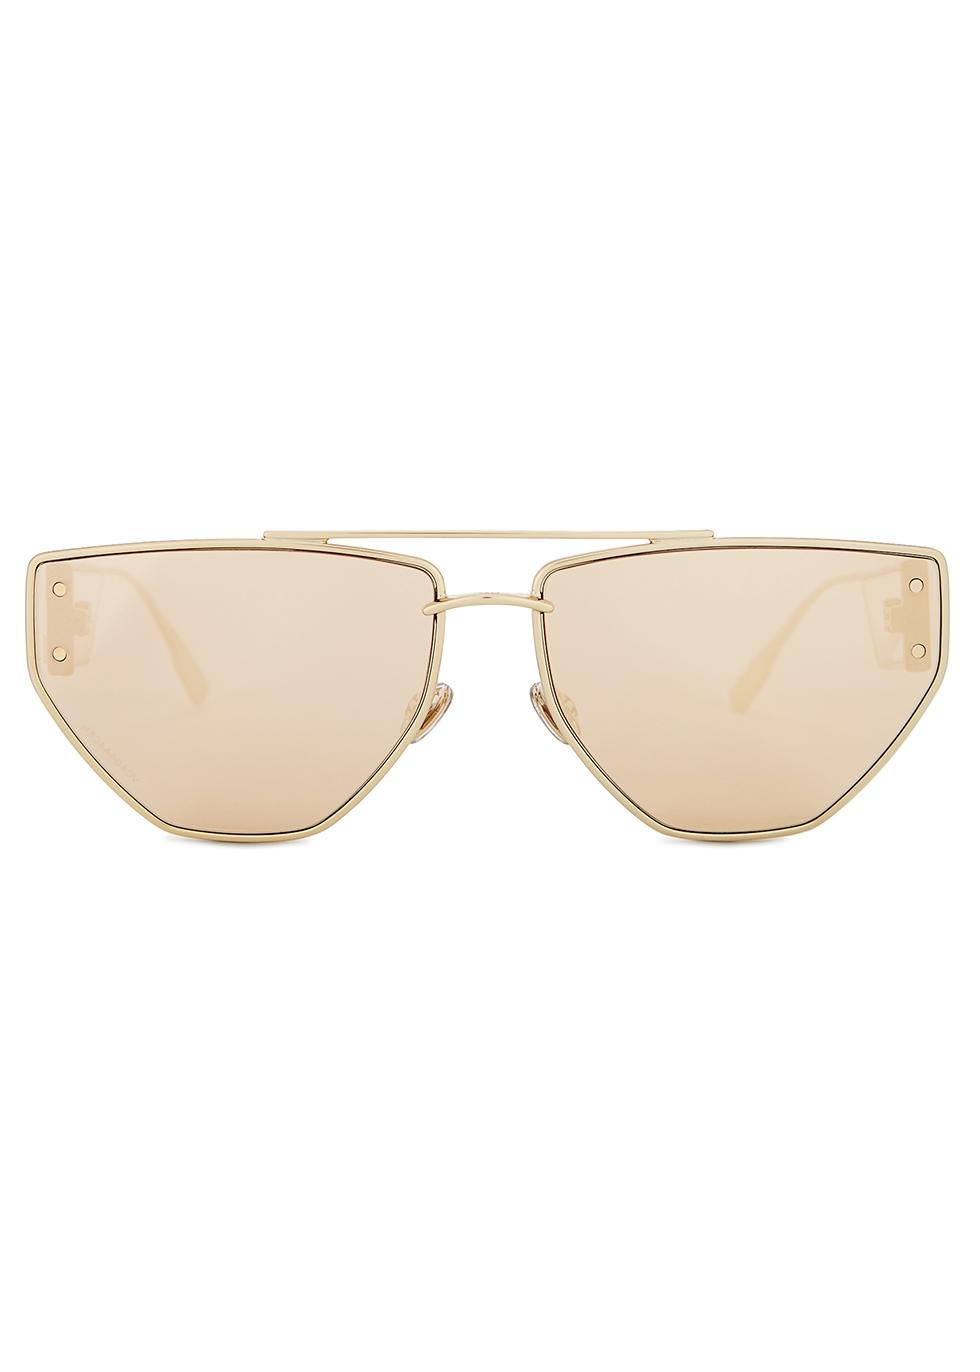 DiorClan 2 mirrored aviator-style sunglasses - Dior